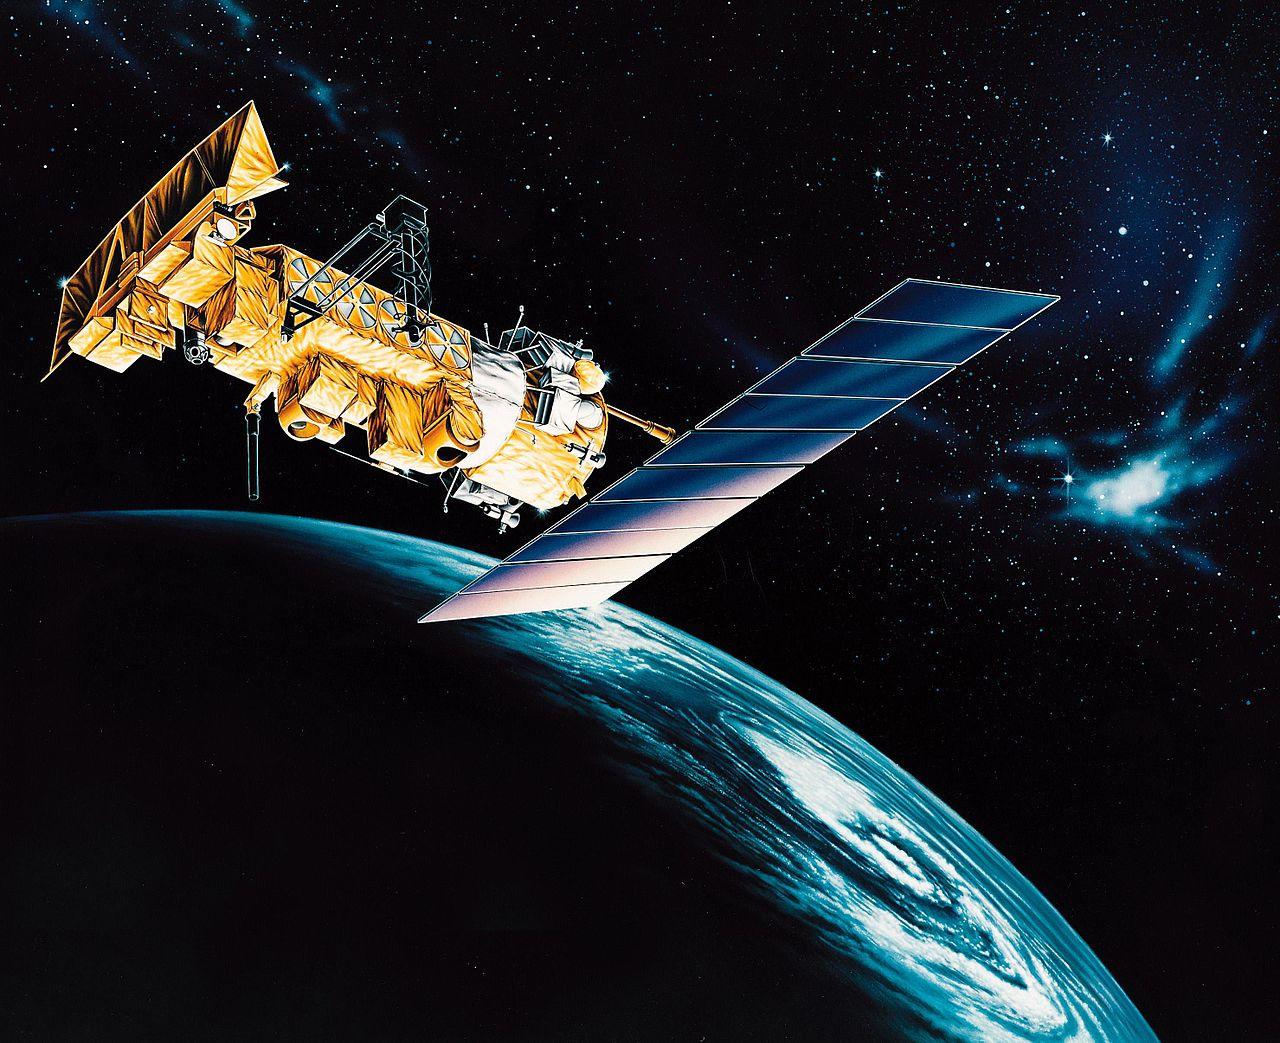 Retired NOAA 17 satellite breaks up in orbit creating debris hazard then Yunhai 1-02 does the same